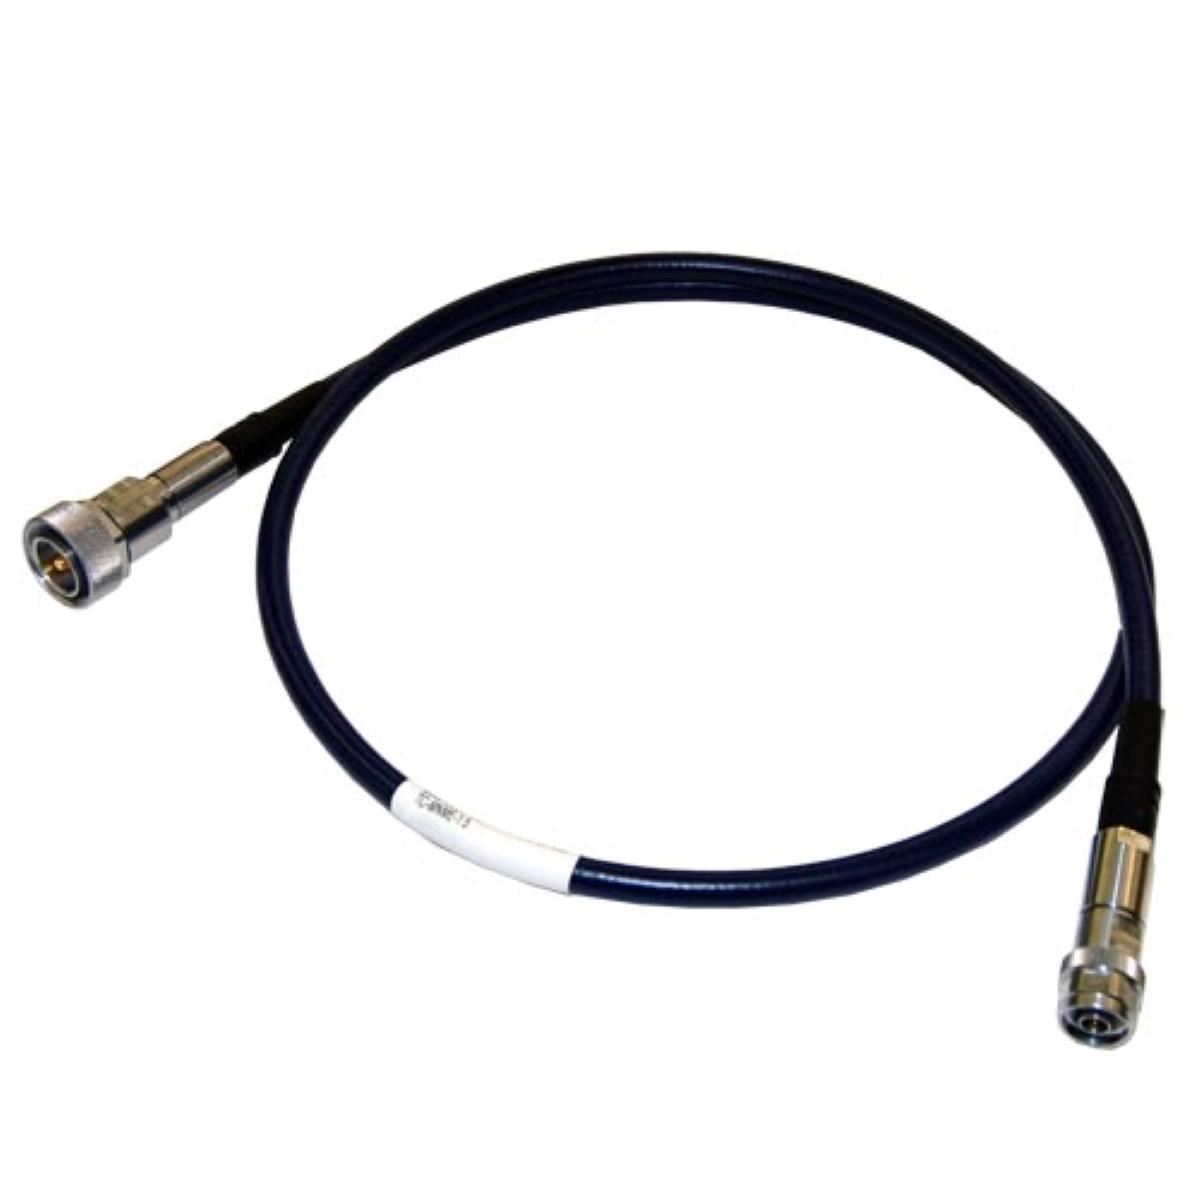 Cable de prueba RF Bird RF TC-MNFE-1-5 Test Cable 1-5m N M – 7/16 DIN F DC-6 GHz